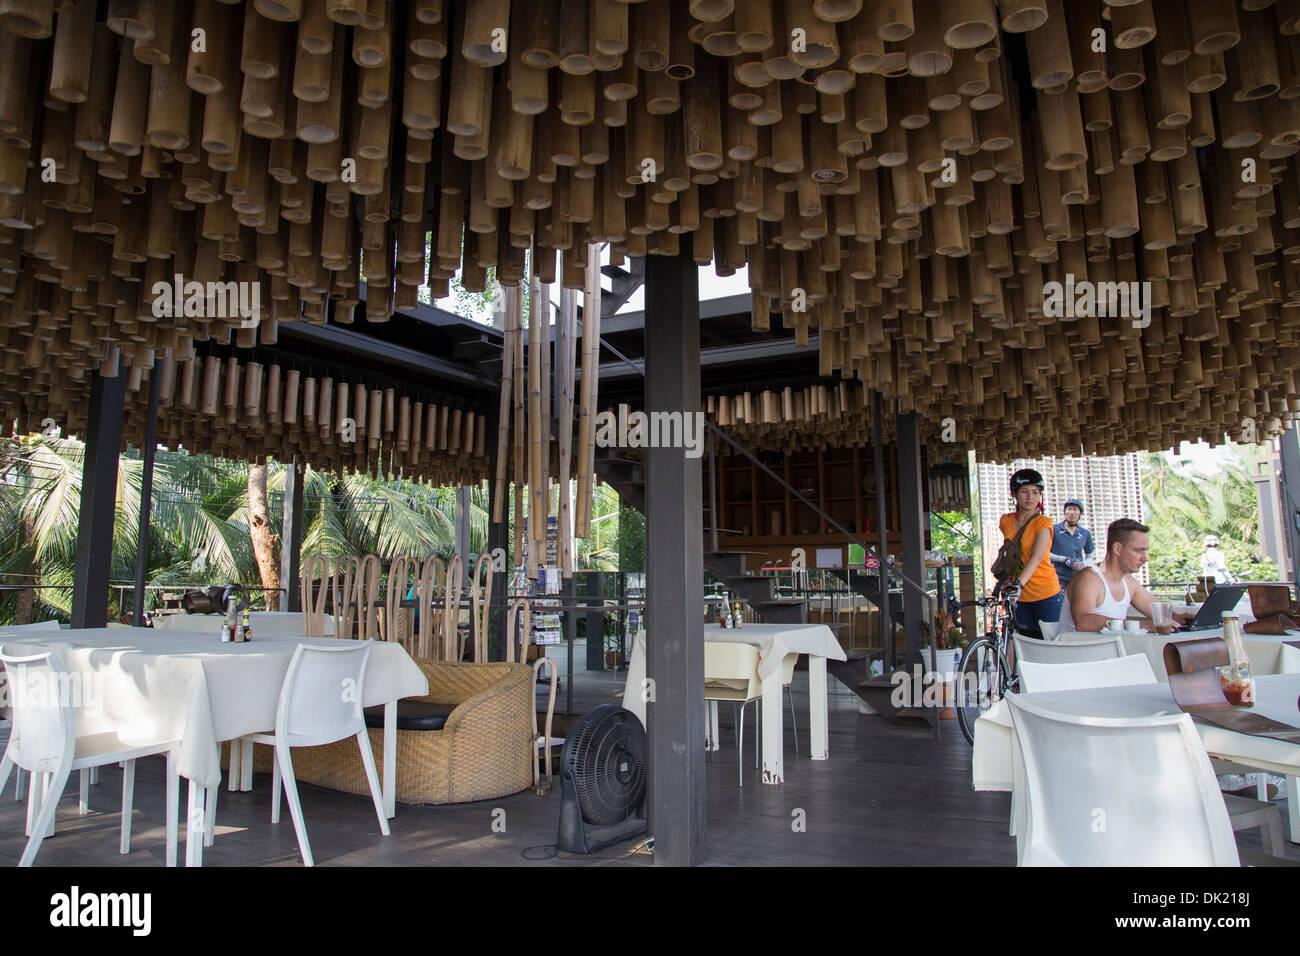 Bamboo ceiling at Bangkok Tree House -  a unique eco hotel on Phra Pradaeng Peninsula - Stock Image